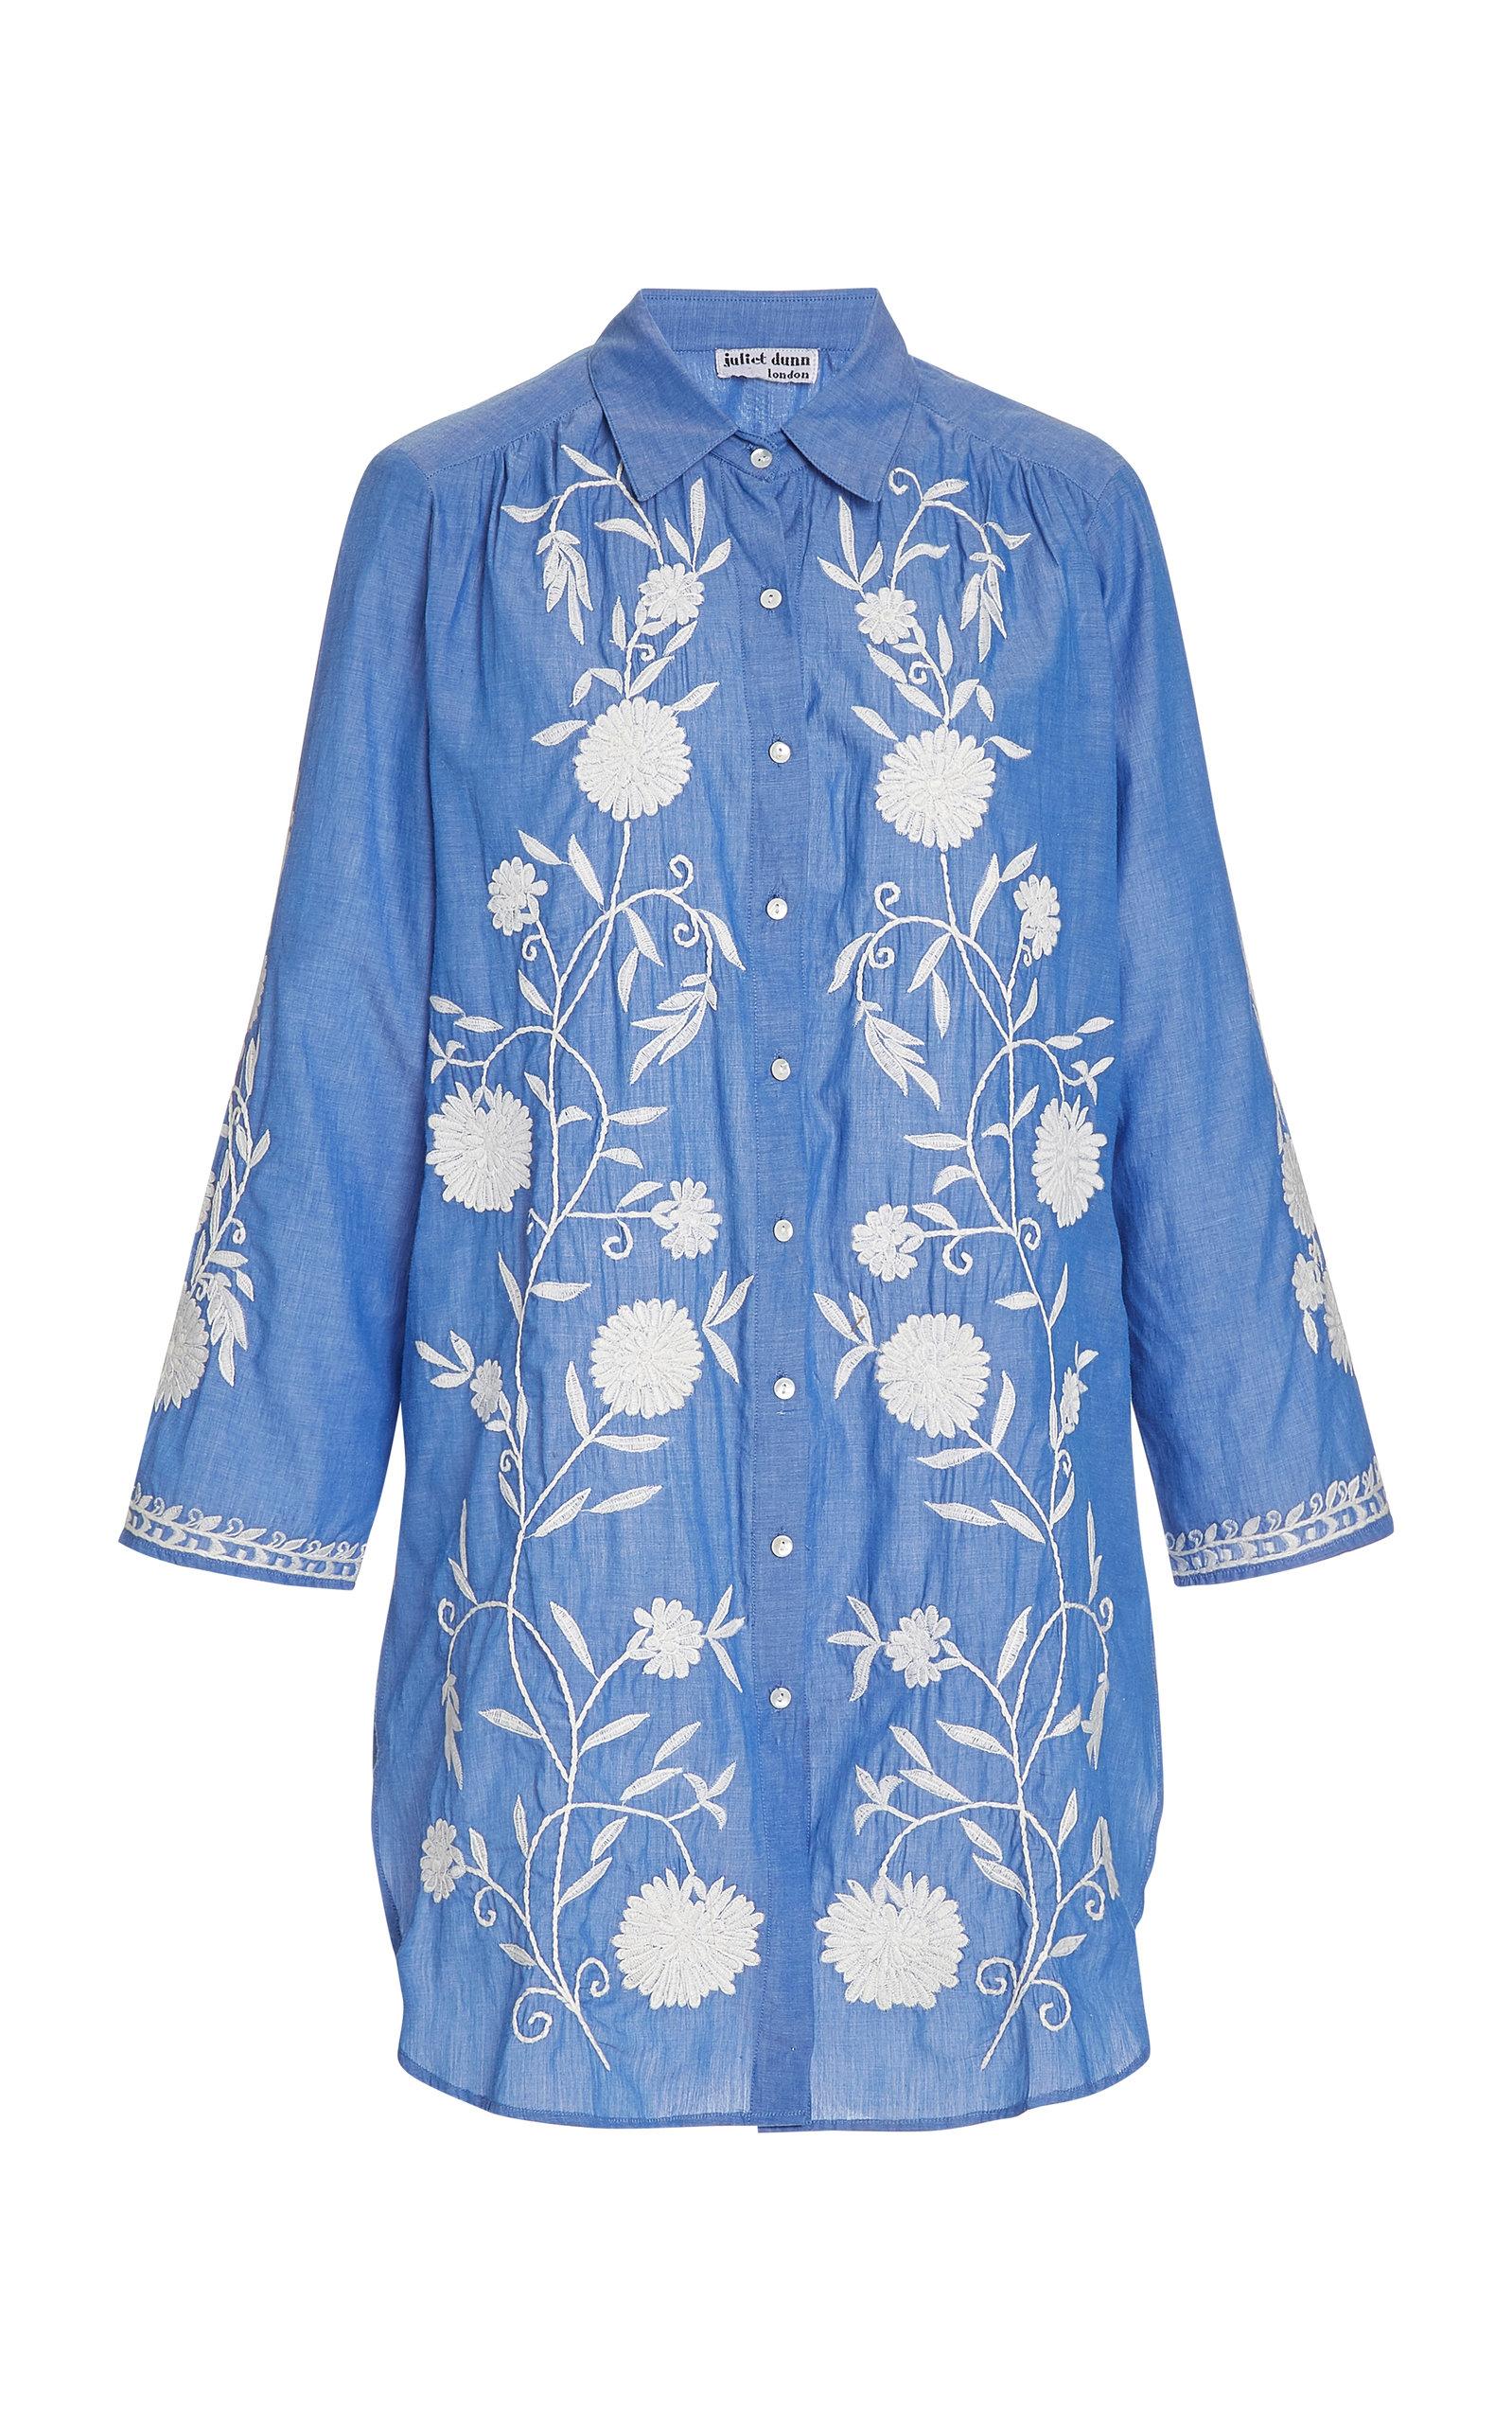 Buy Juliet Dunn Floral-Embroidered Cotton Chambray Shirt Dress online, shop Juliet Dunn at the best price